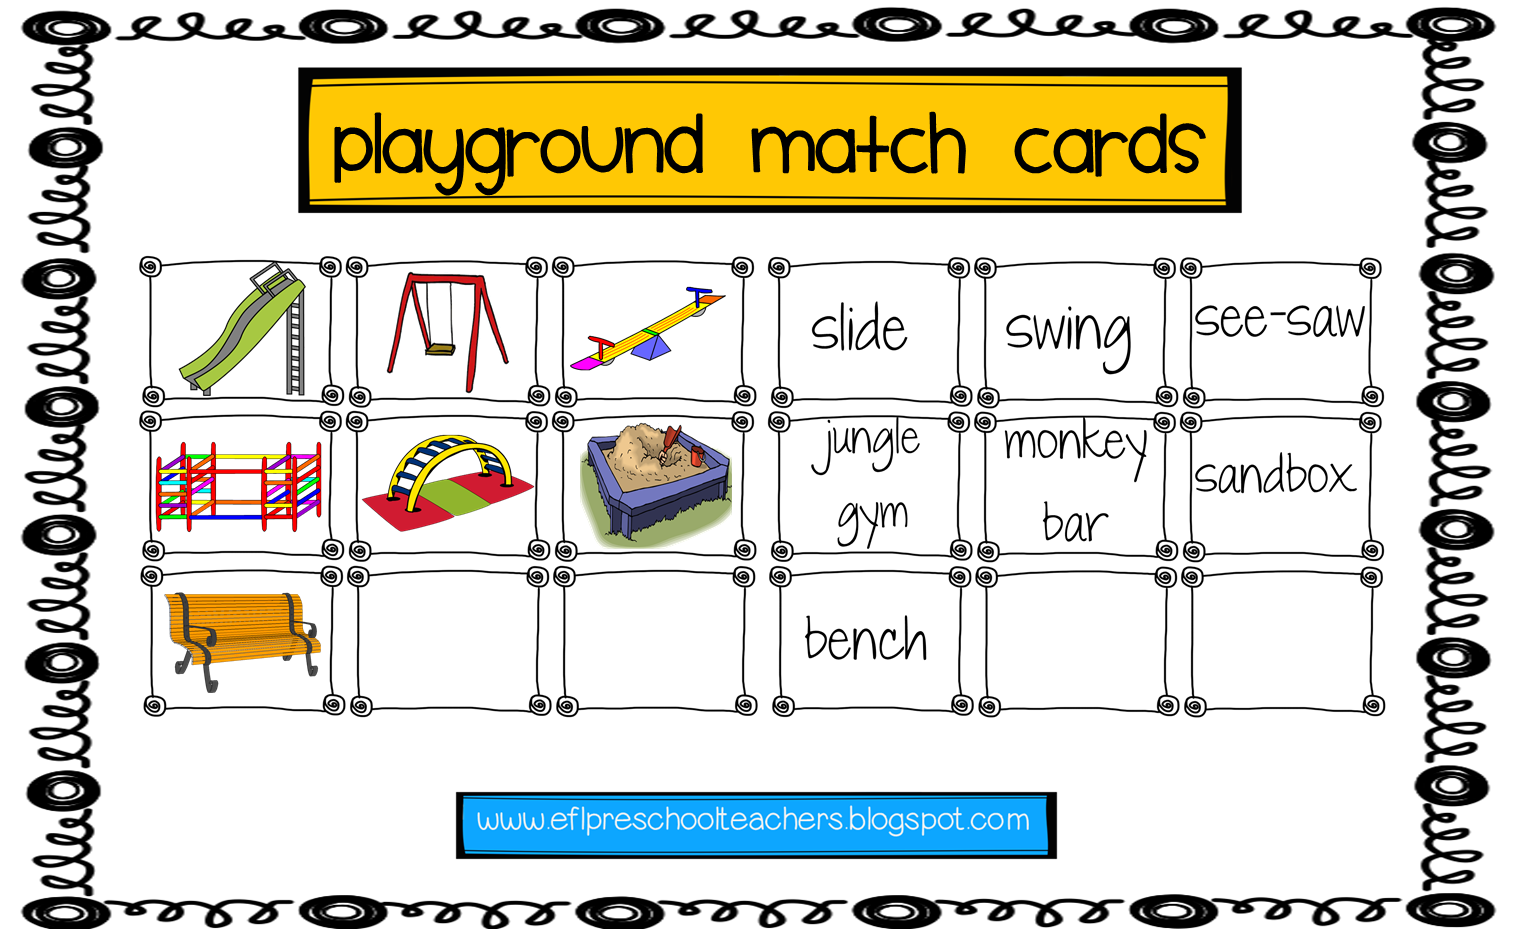 Esl Efl Preschool Teachers Playground Recess Park